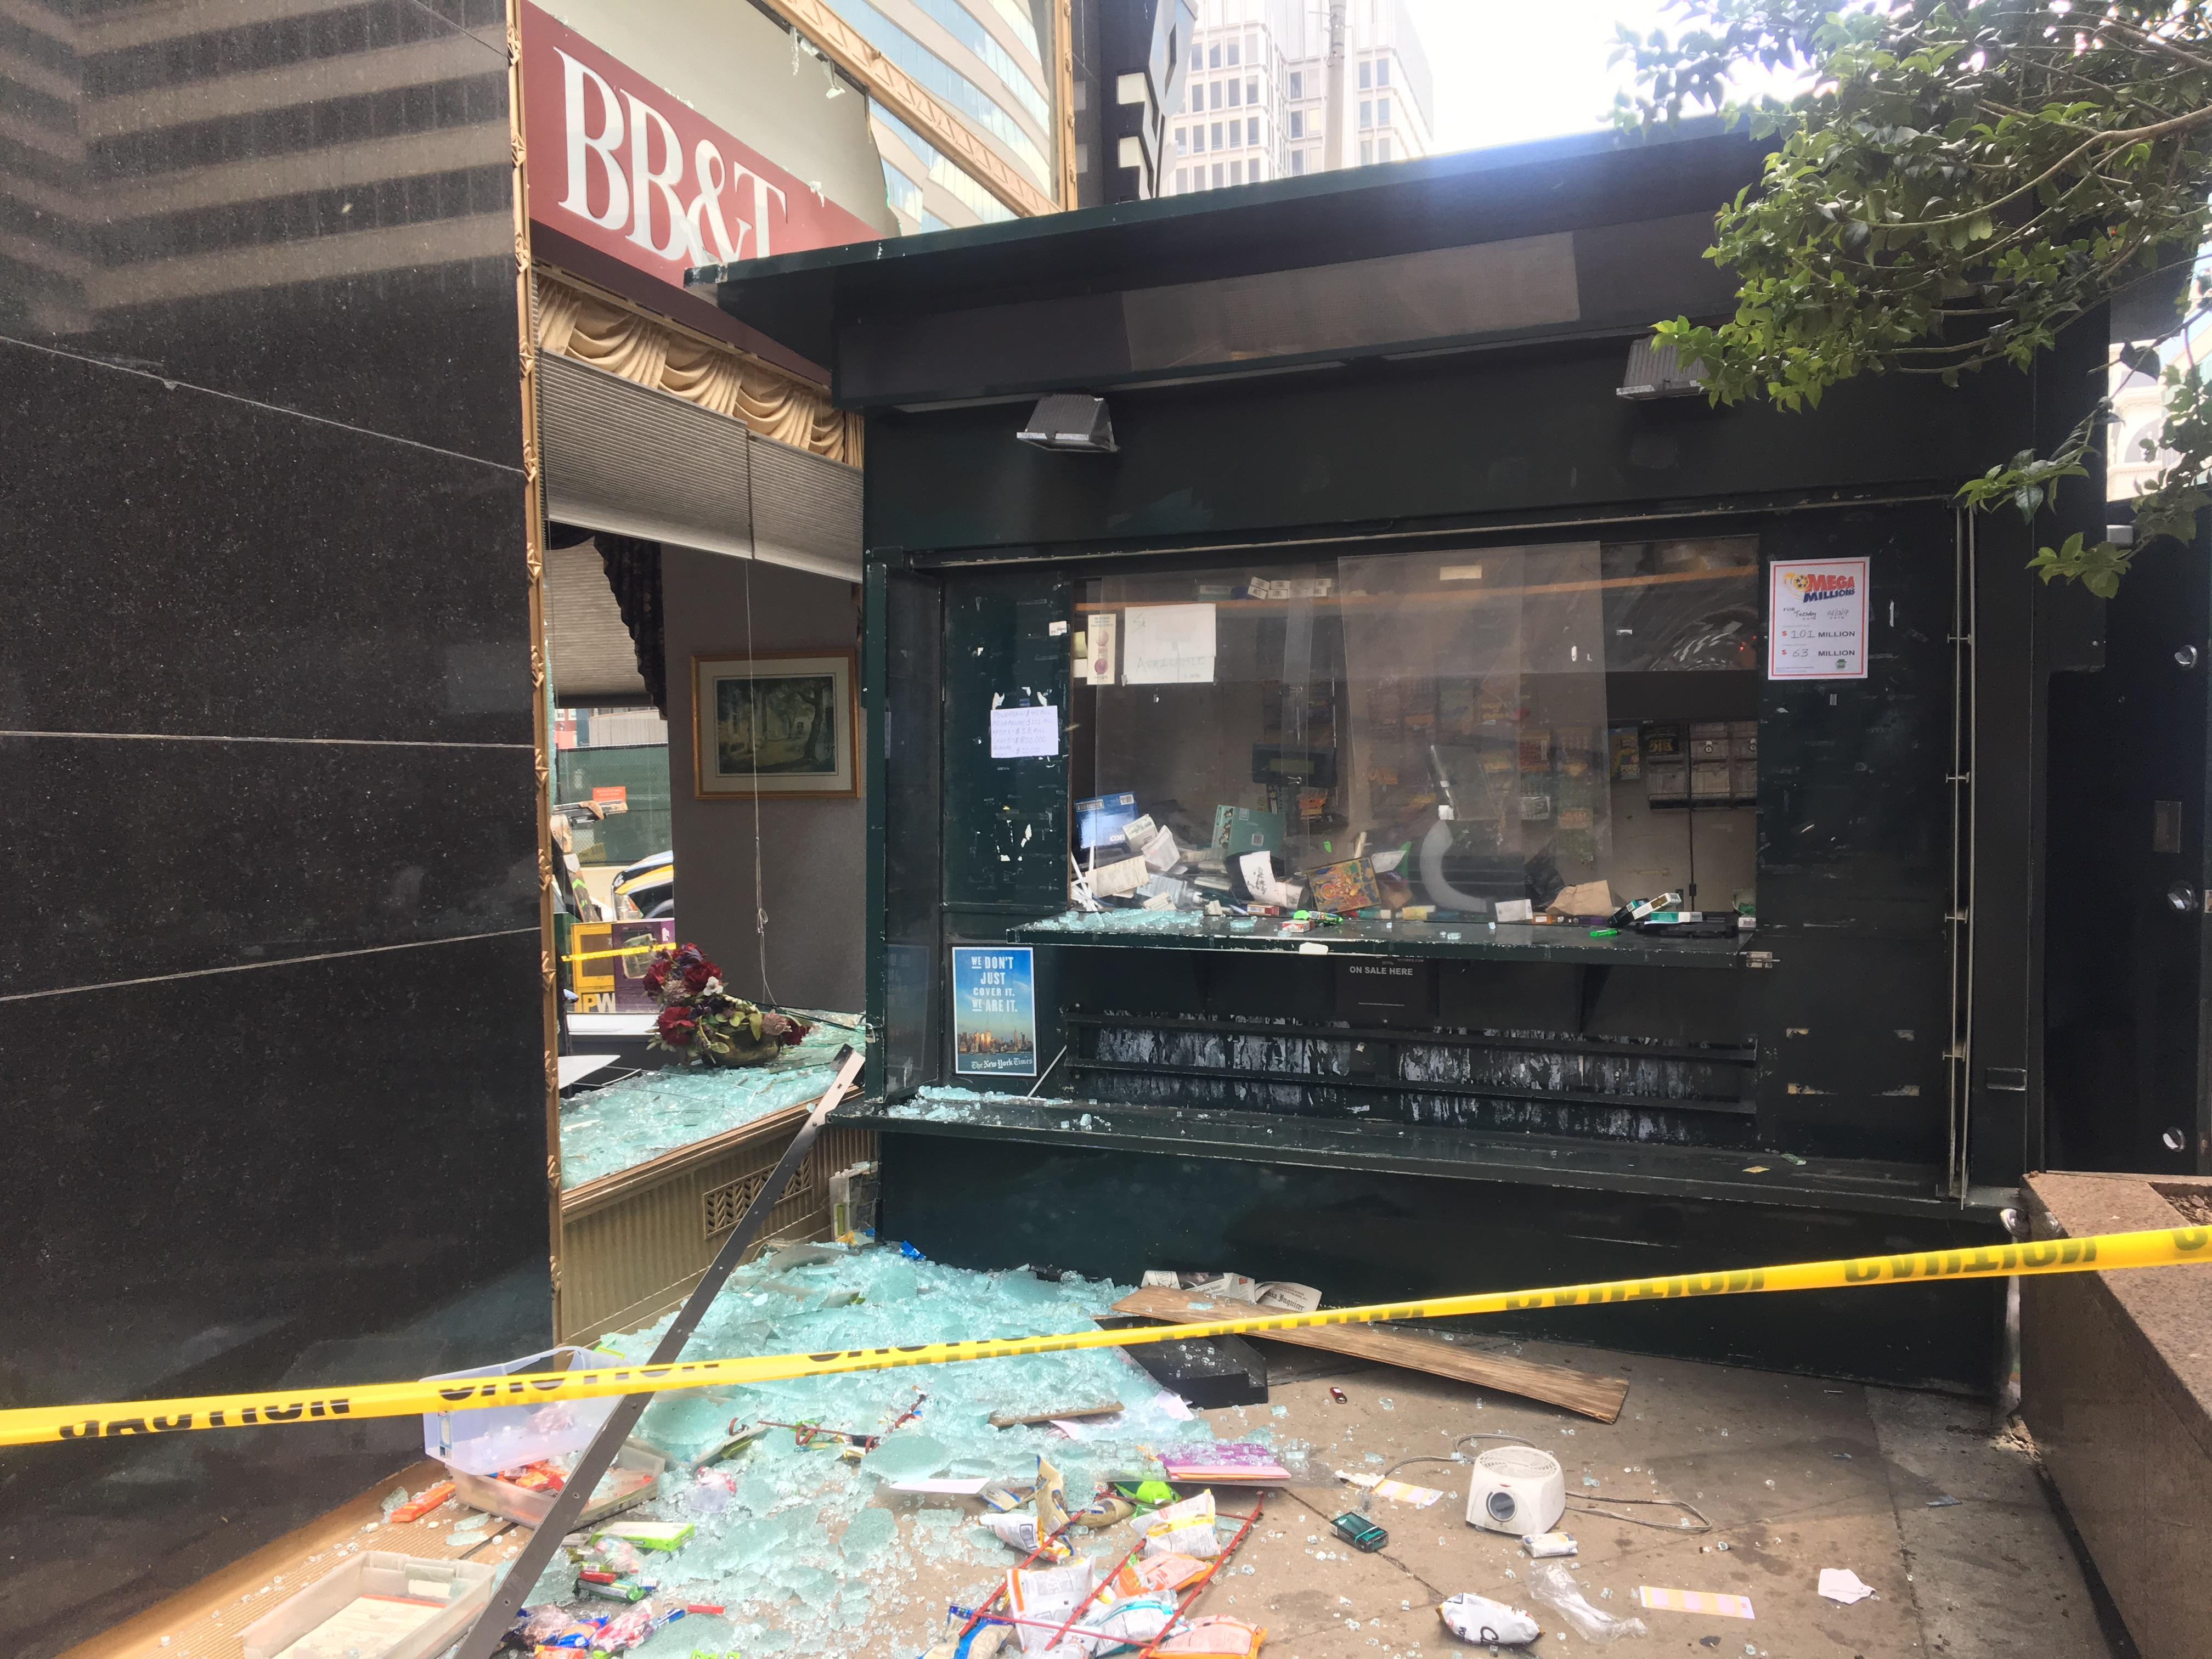 Minivan jumps curb in Center City Philadelphia, hitting pedestrians